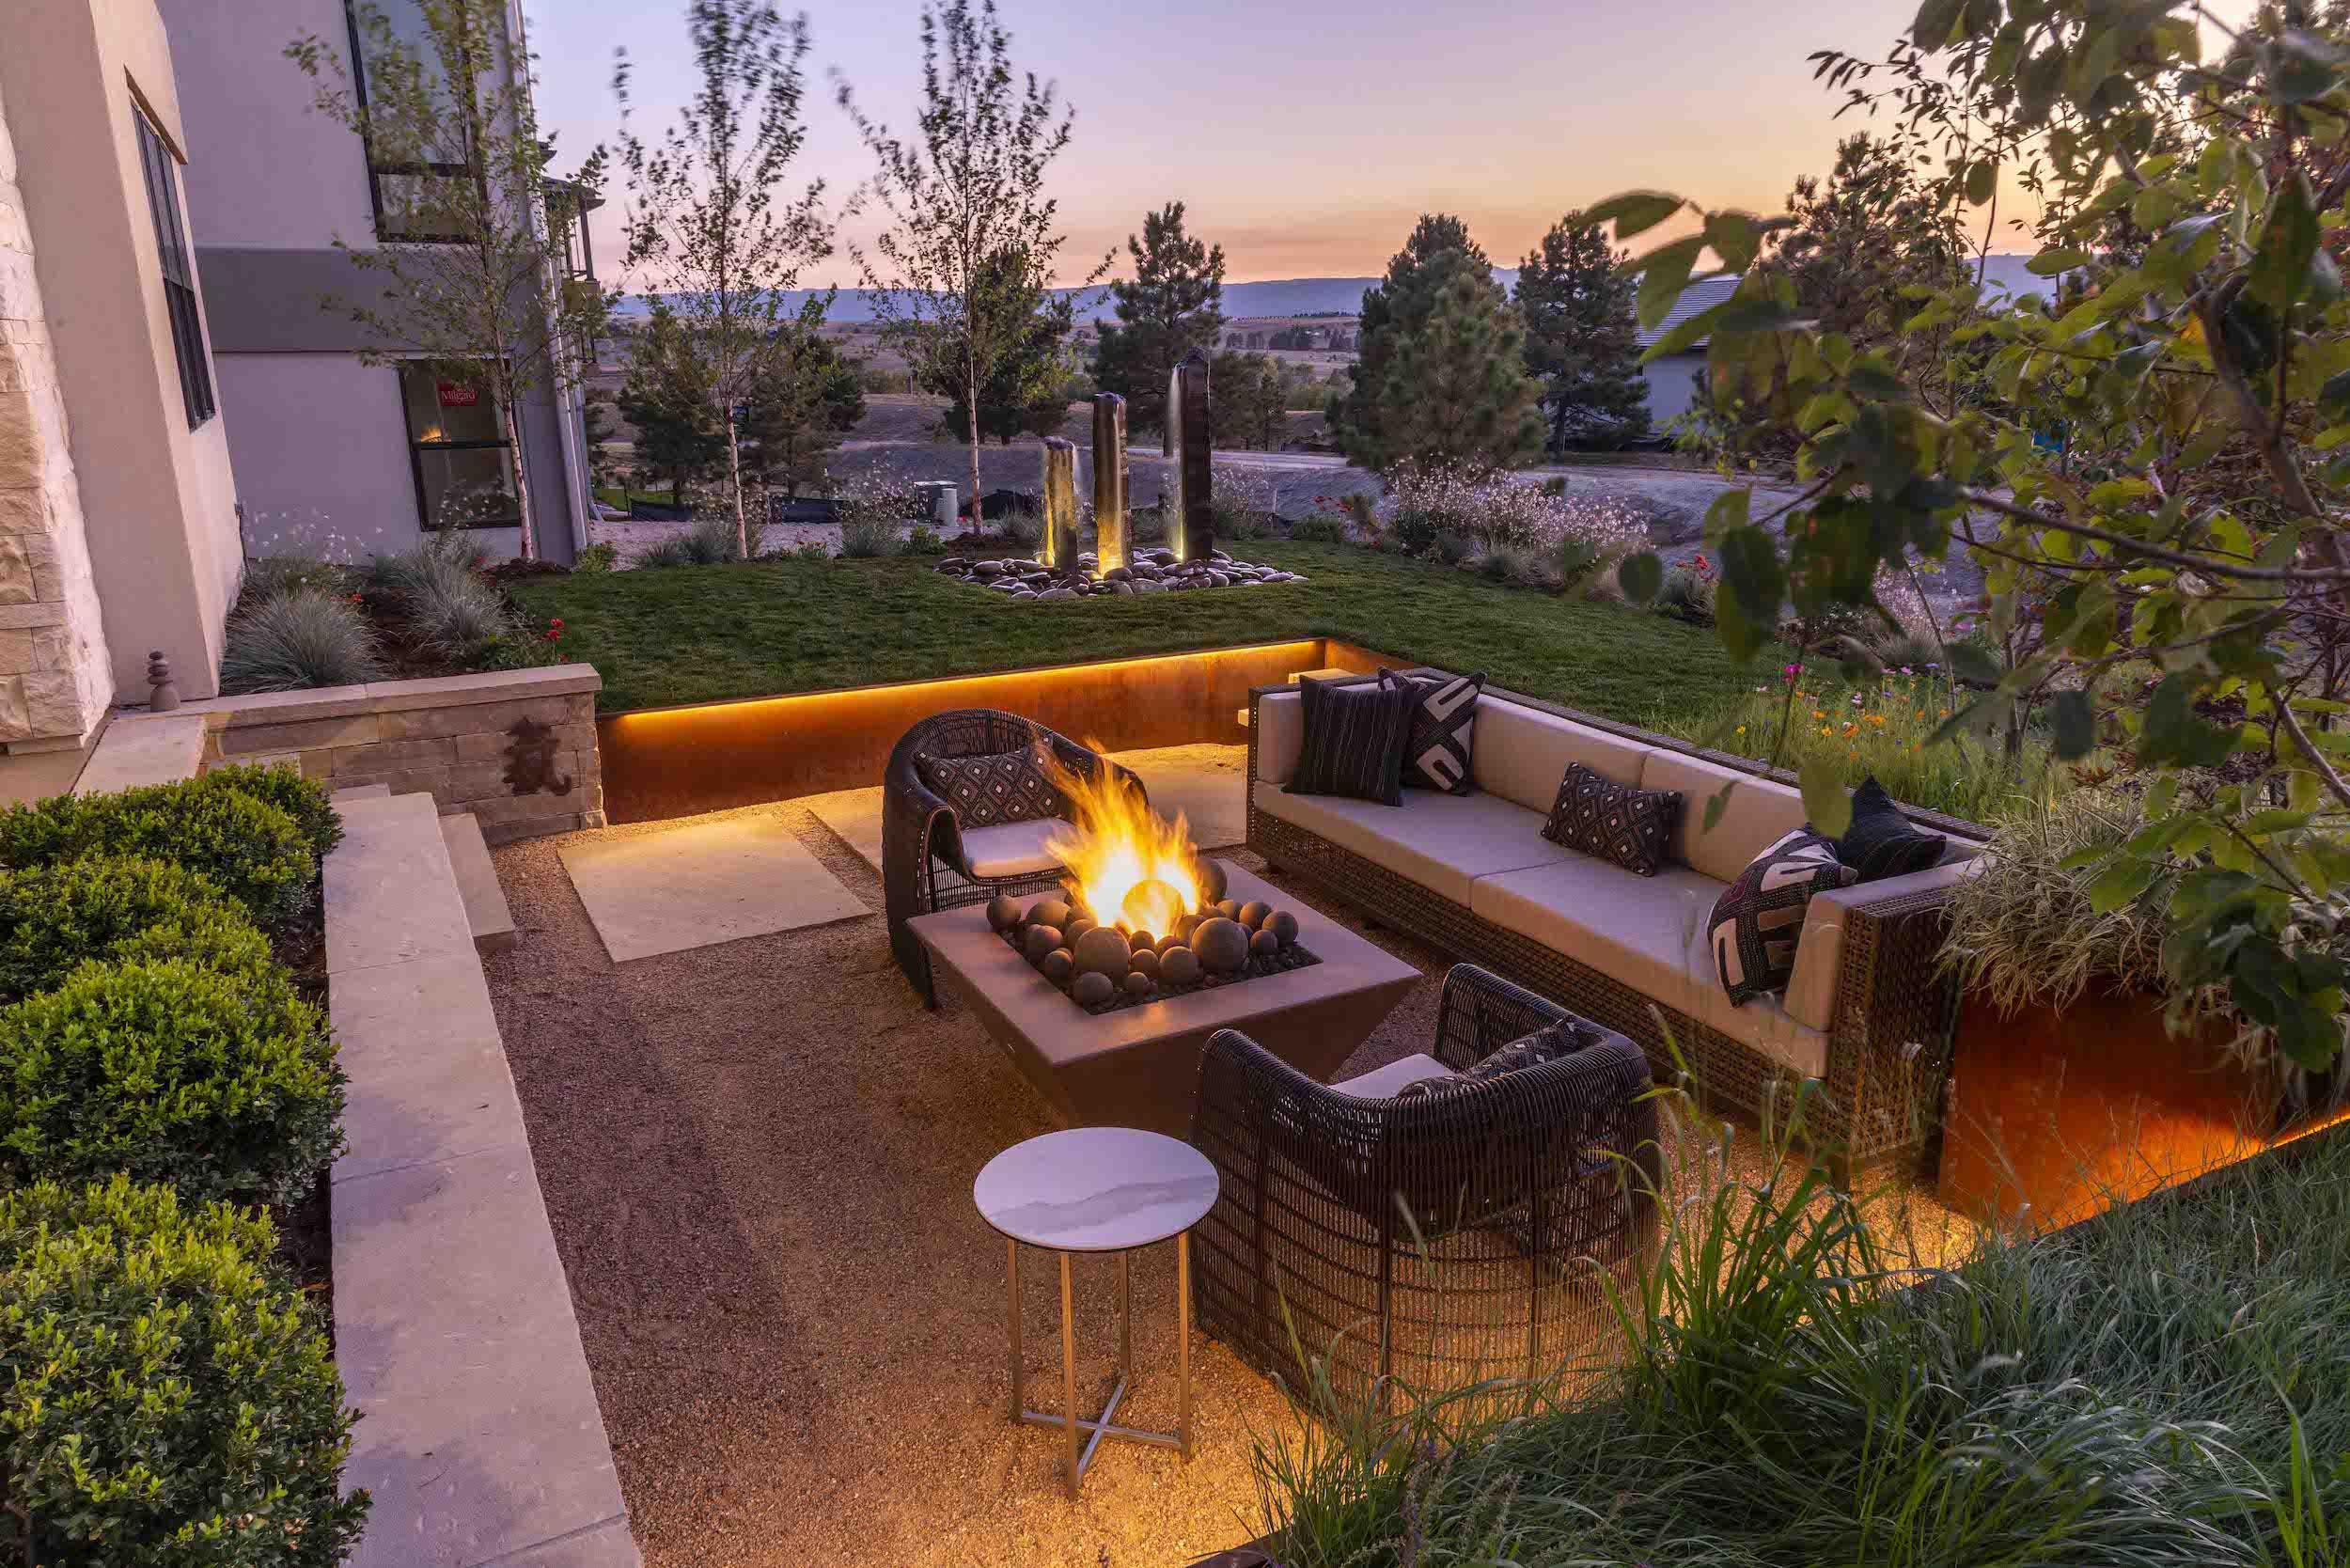 Landscape Architecture Design Firm Lifescape Colorado